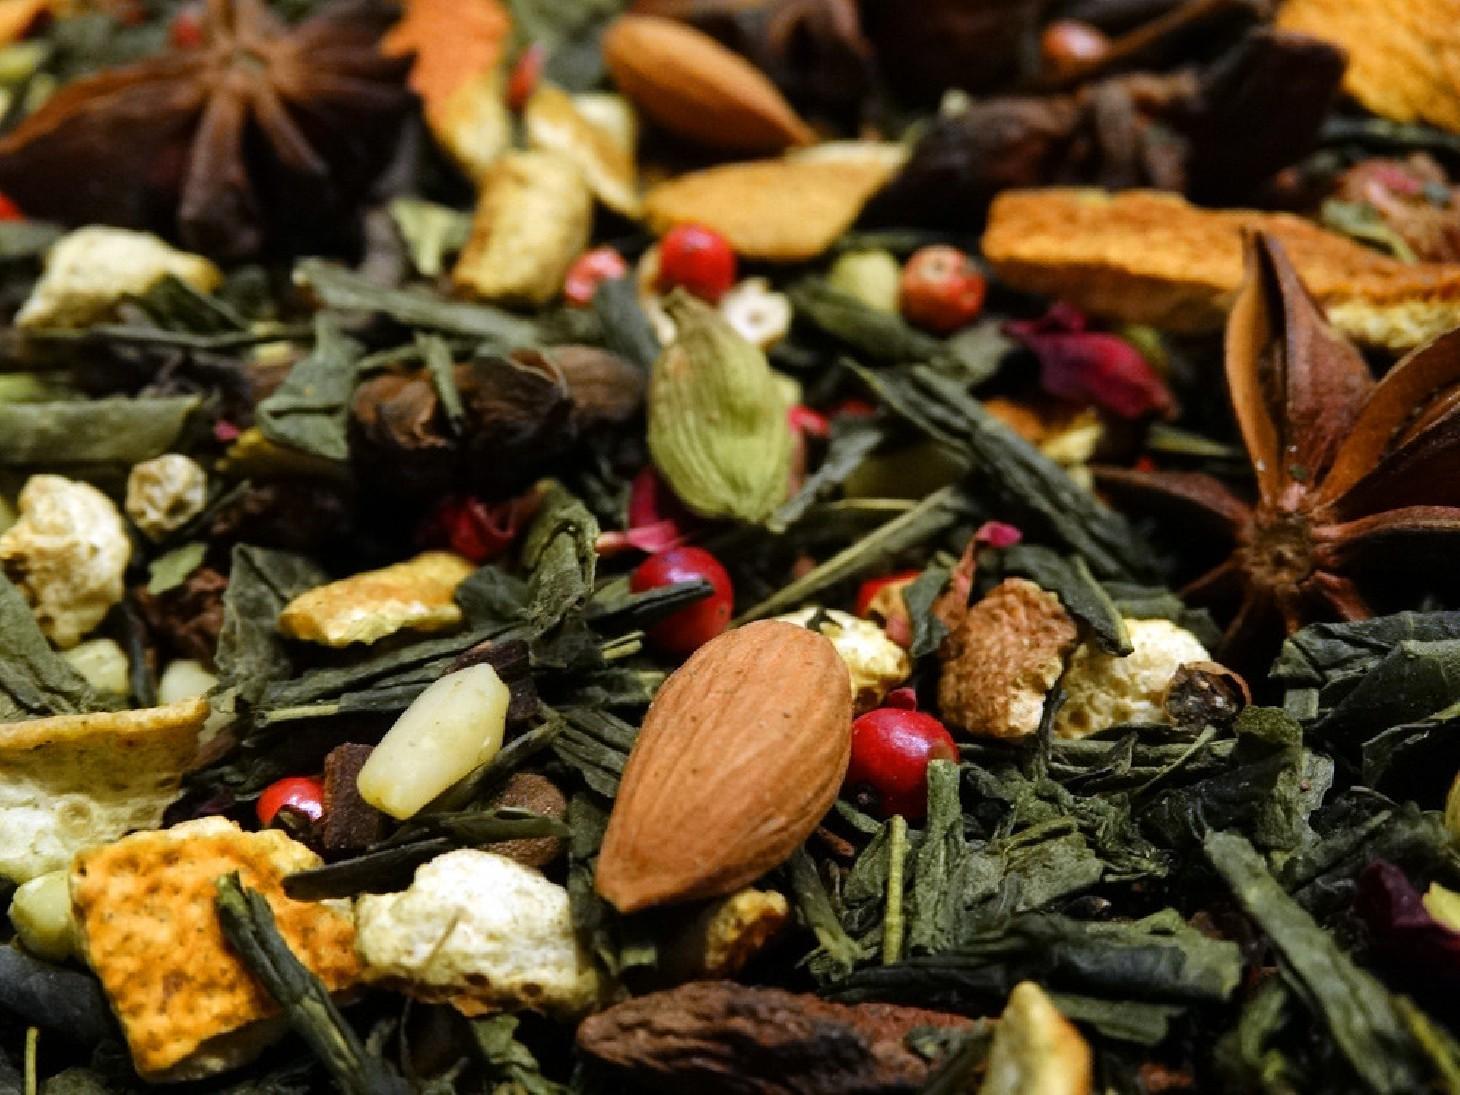 Taiga thé vert aromatisé note pain d'épice taiga par Tea & Cie www.teacie.com